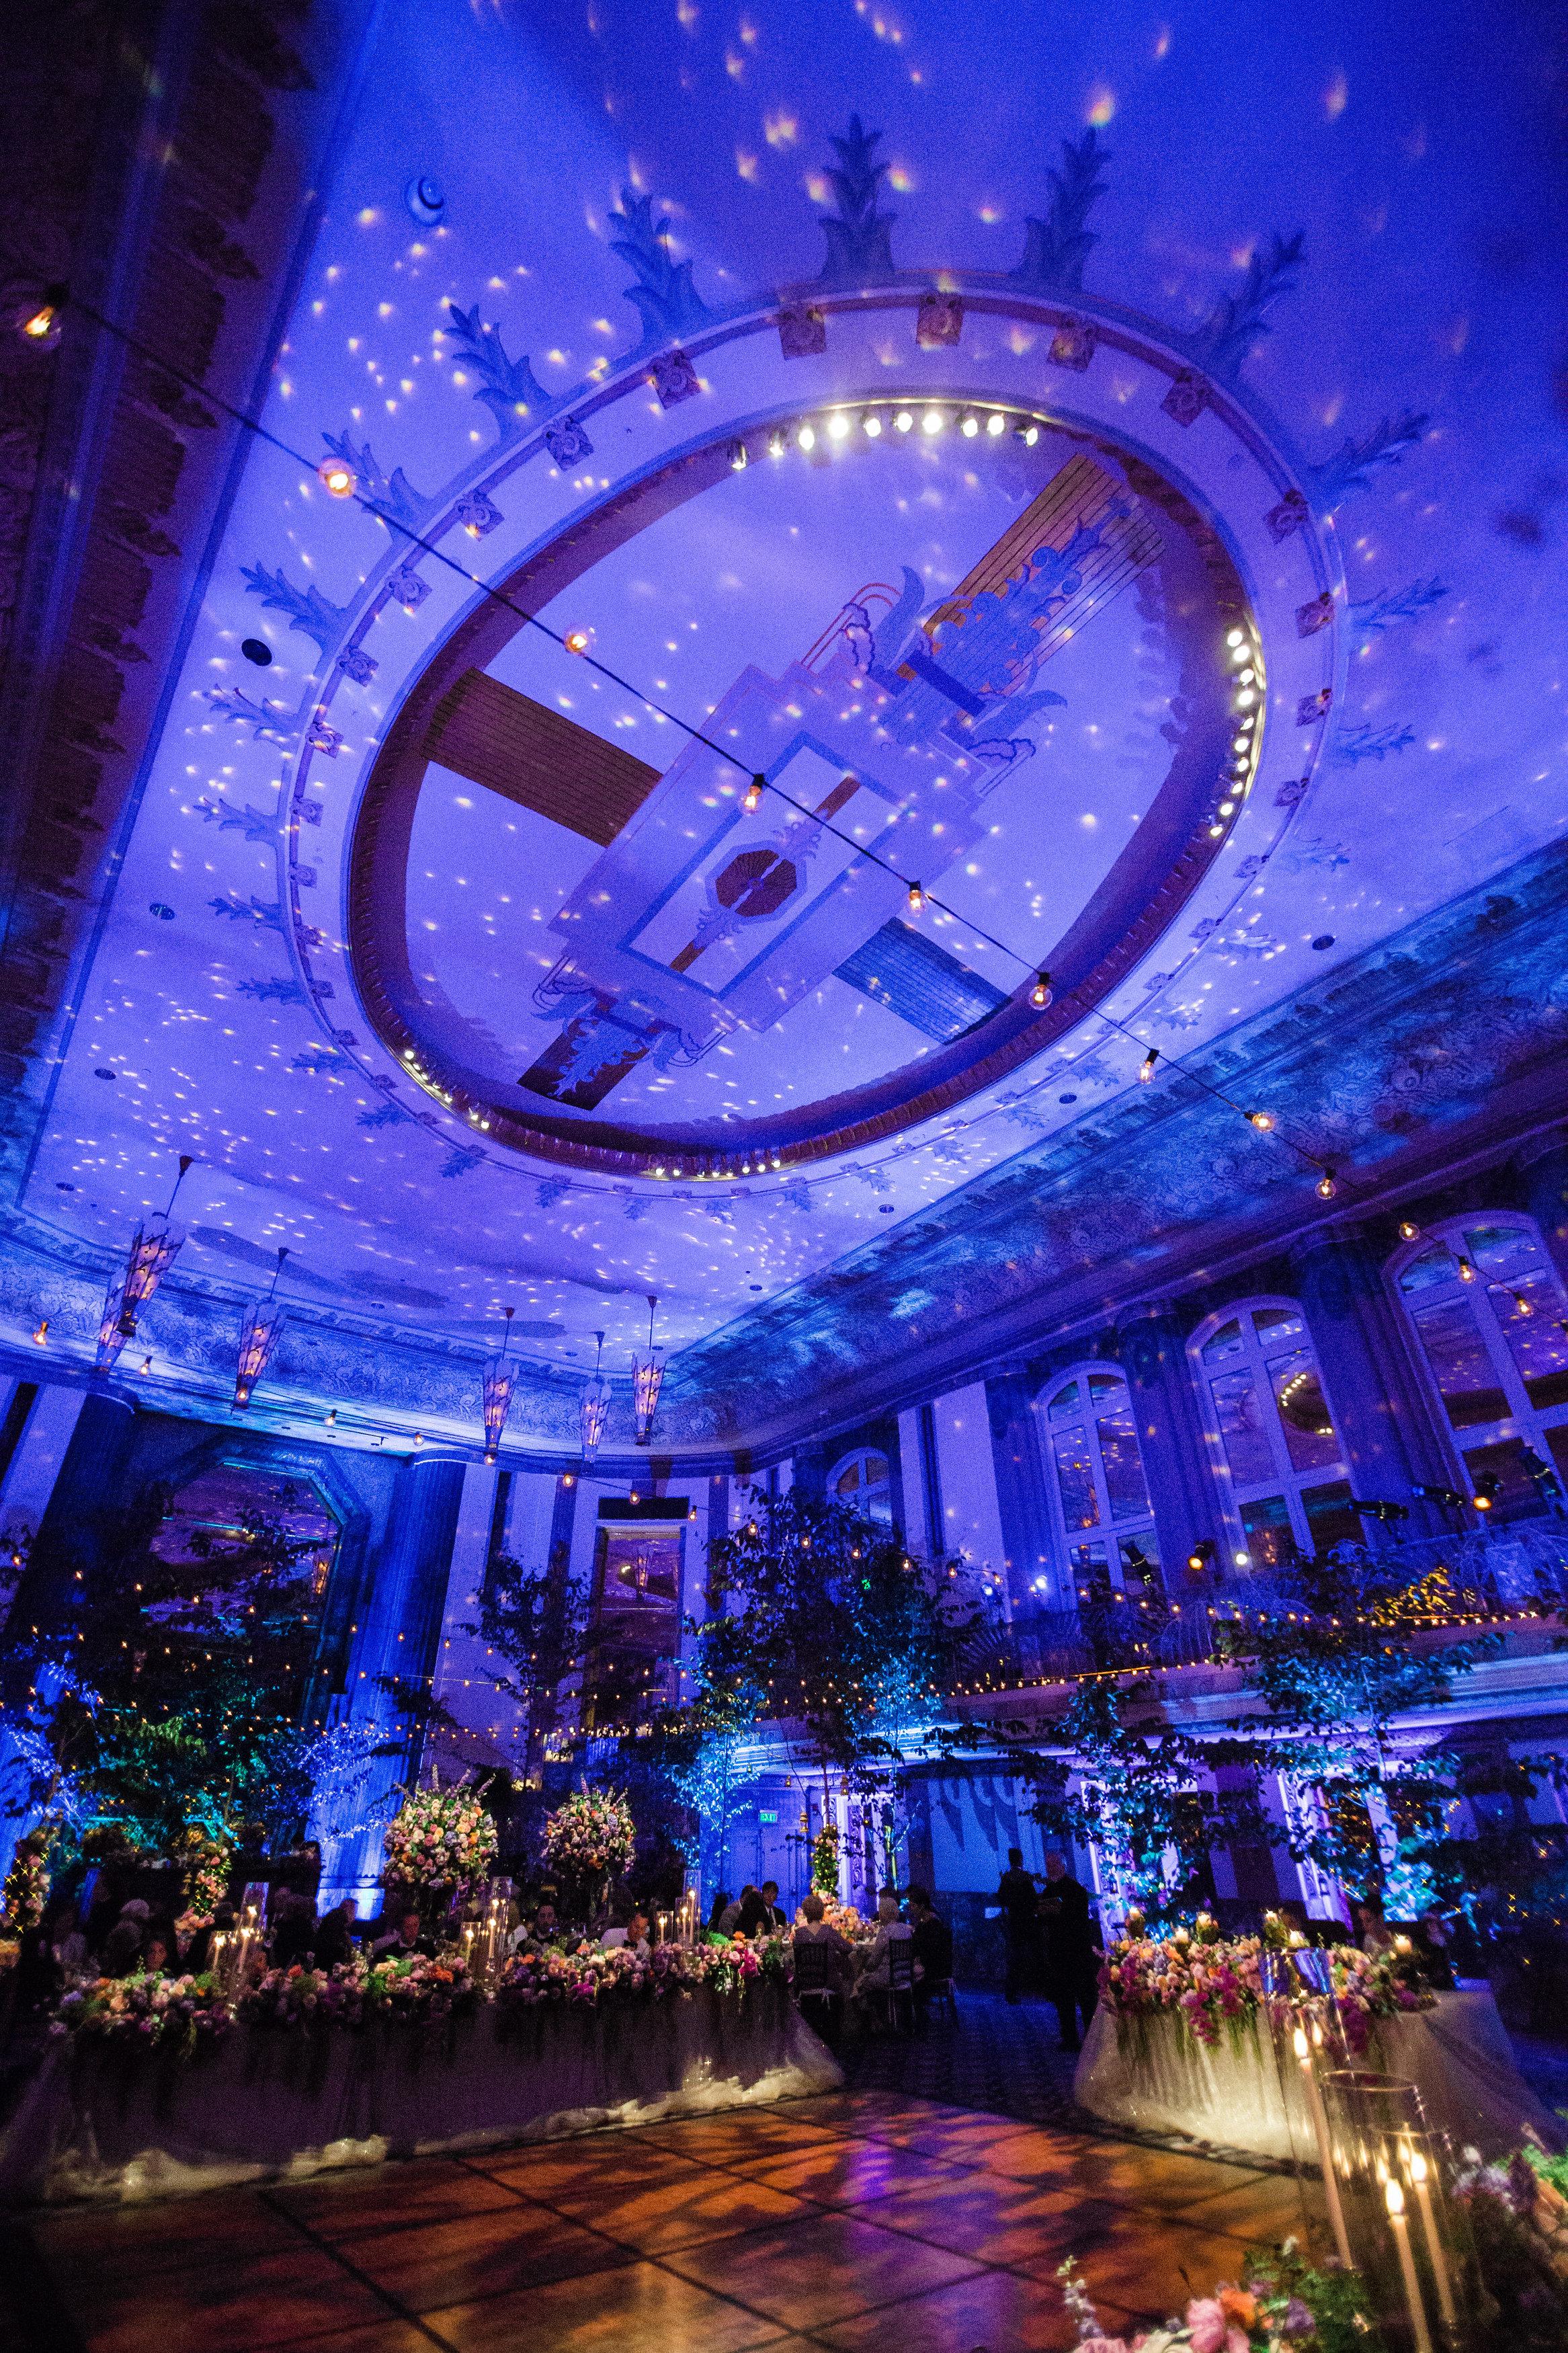 Room Shot at Reception at The Hilton Netherland Plaza Hotel Hall of Mirrors Cincinnati, OH